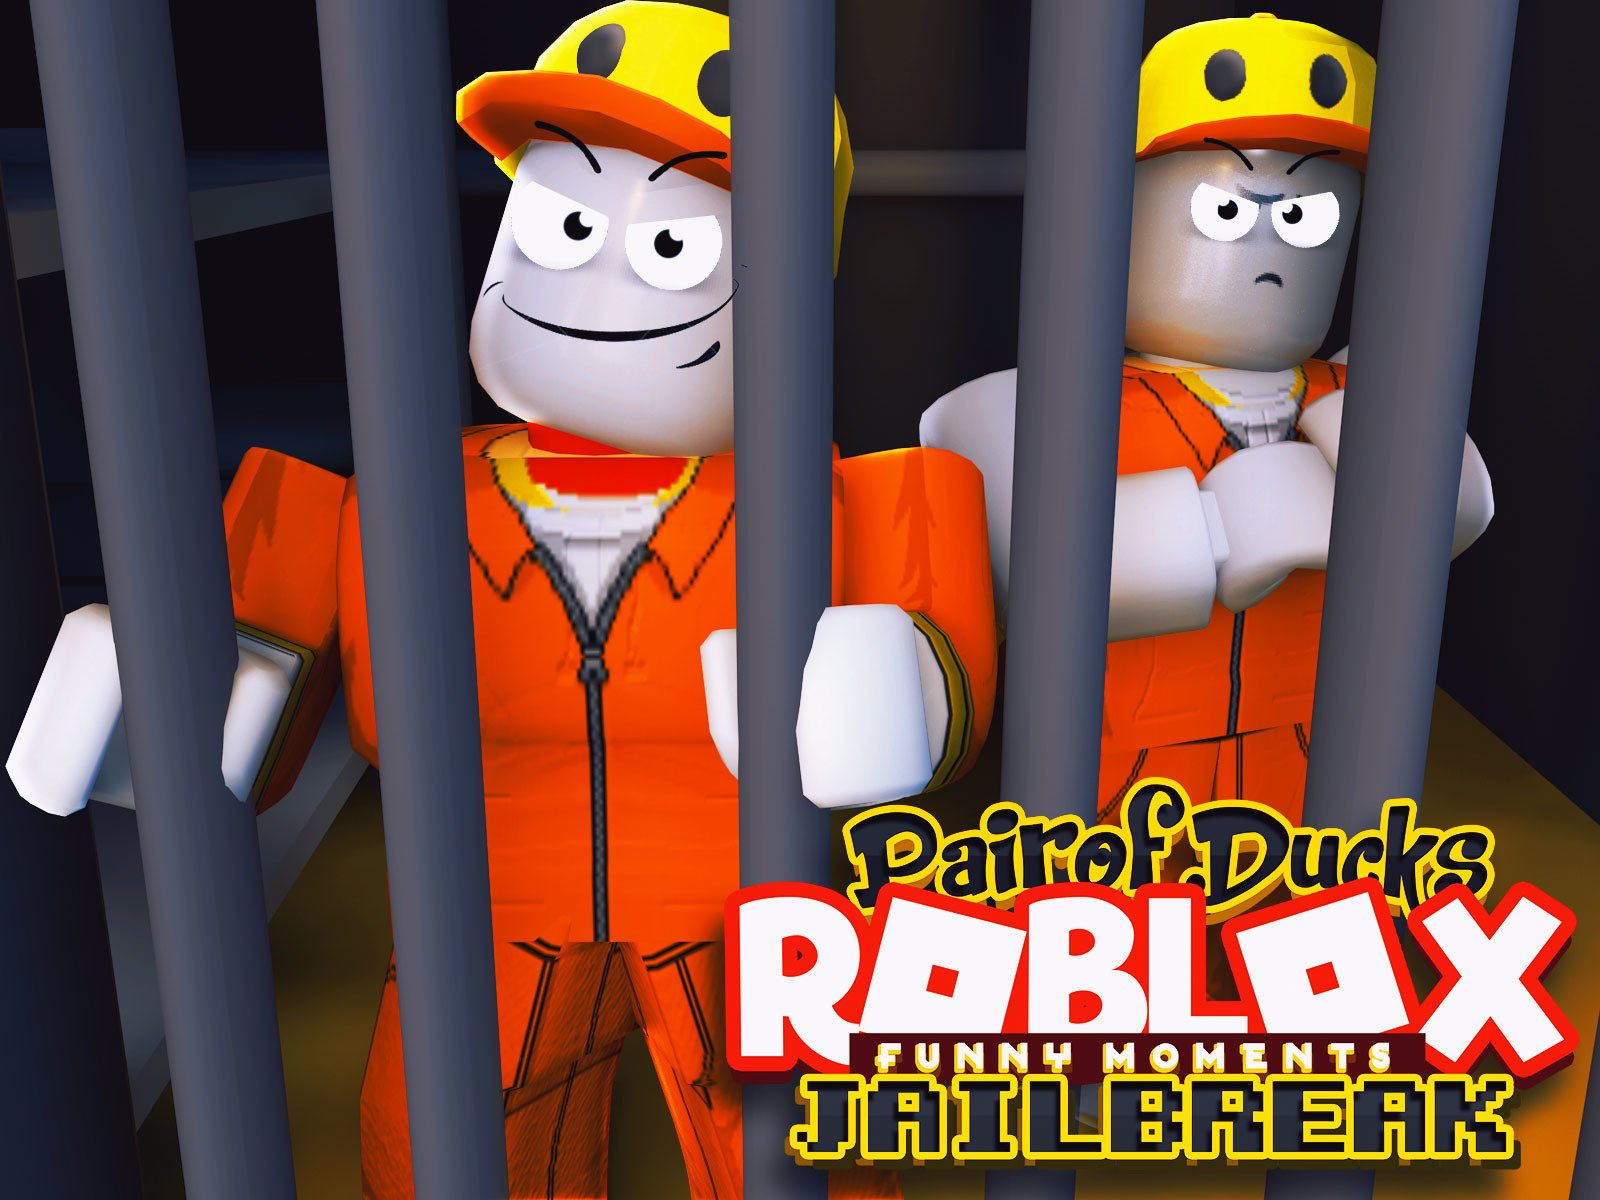 Amazoncom Watch Roblox Jailbreak Pairofducks Funny Moments